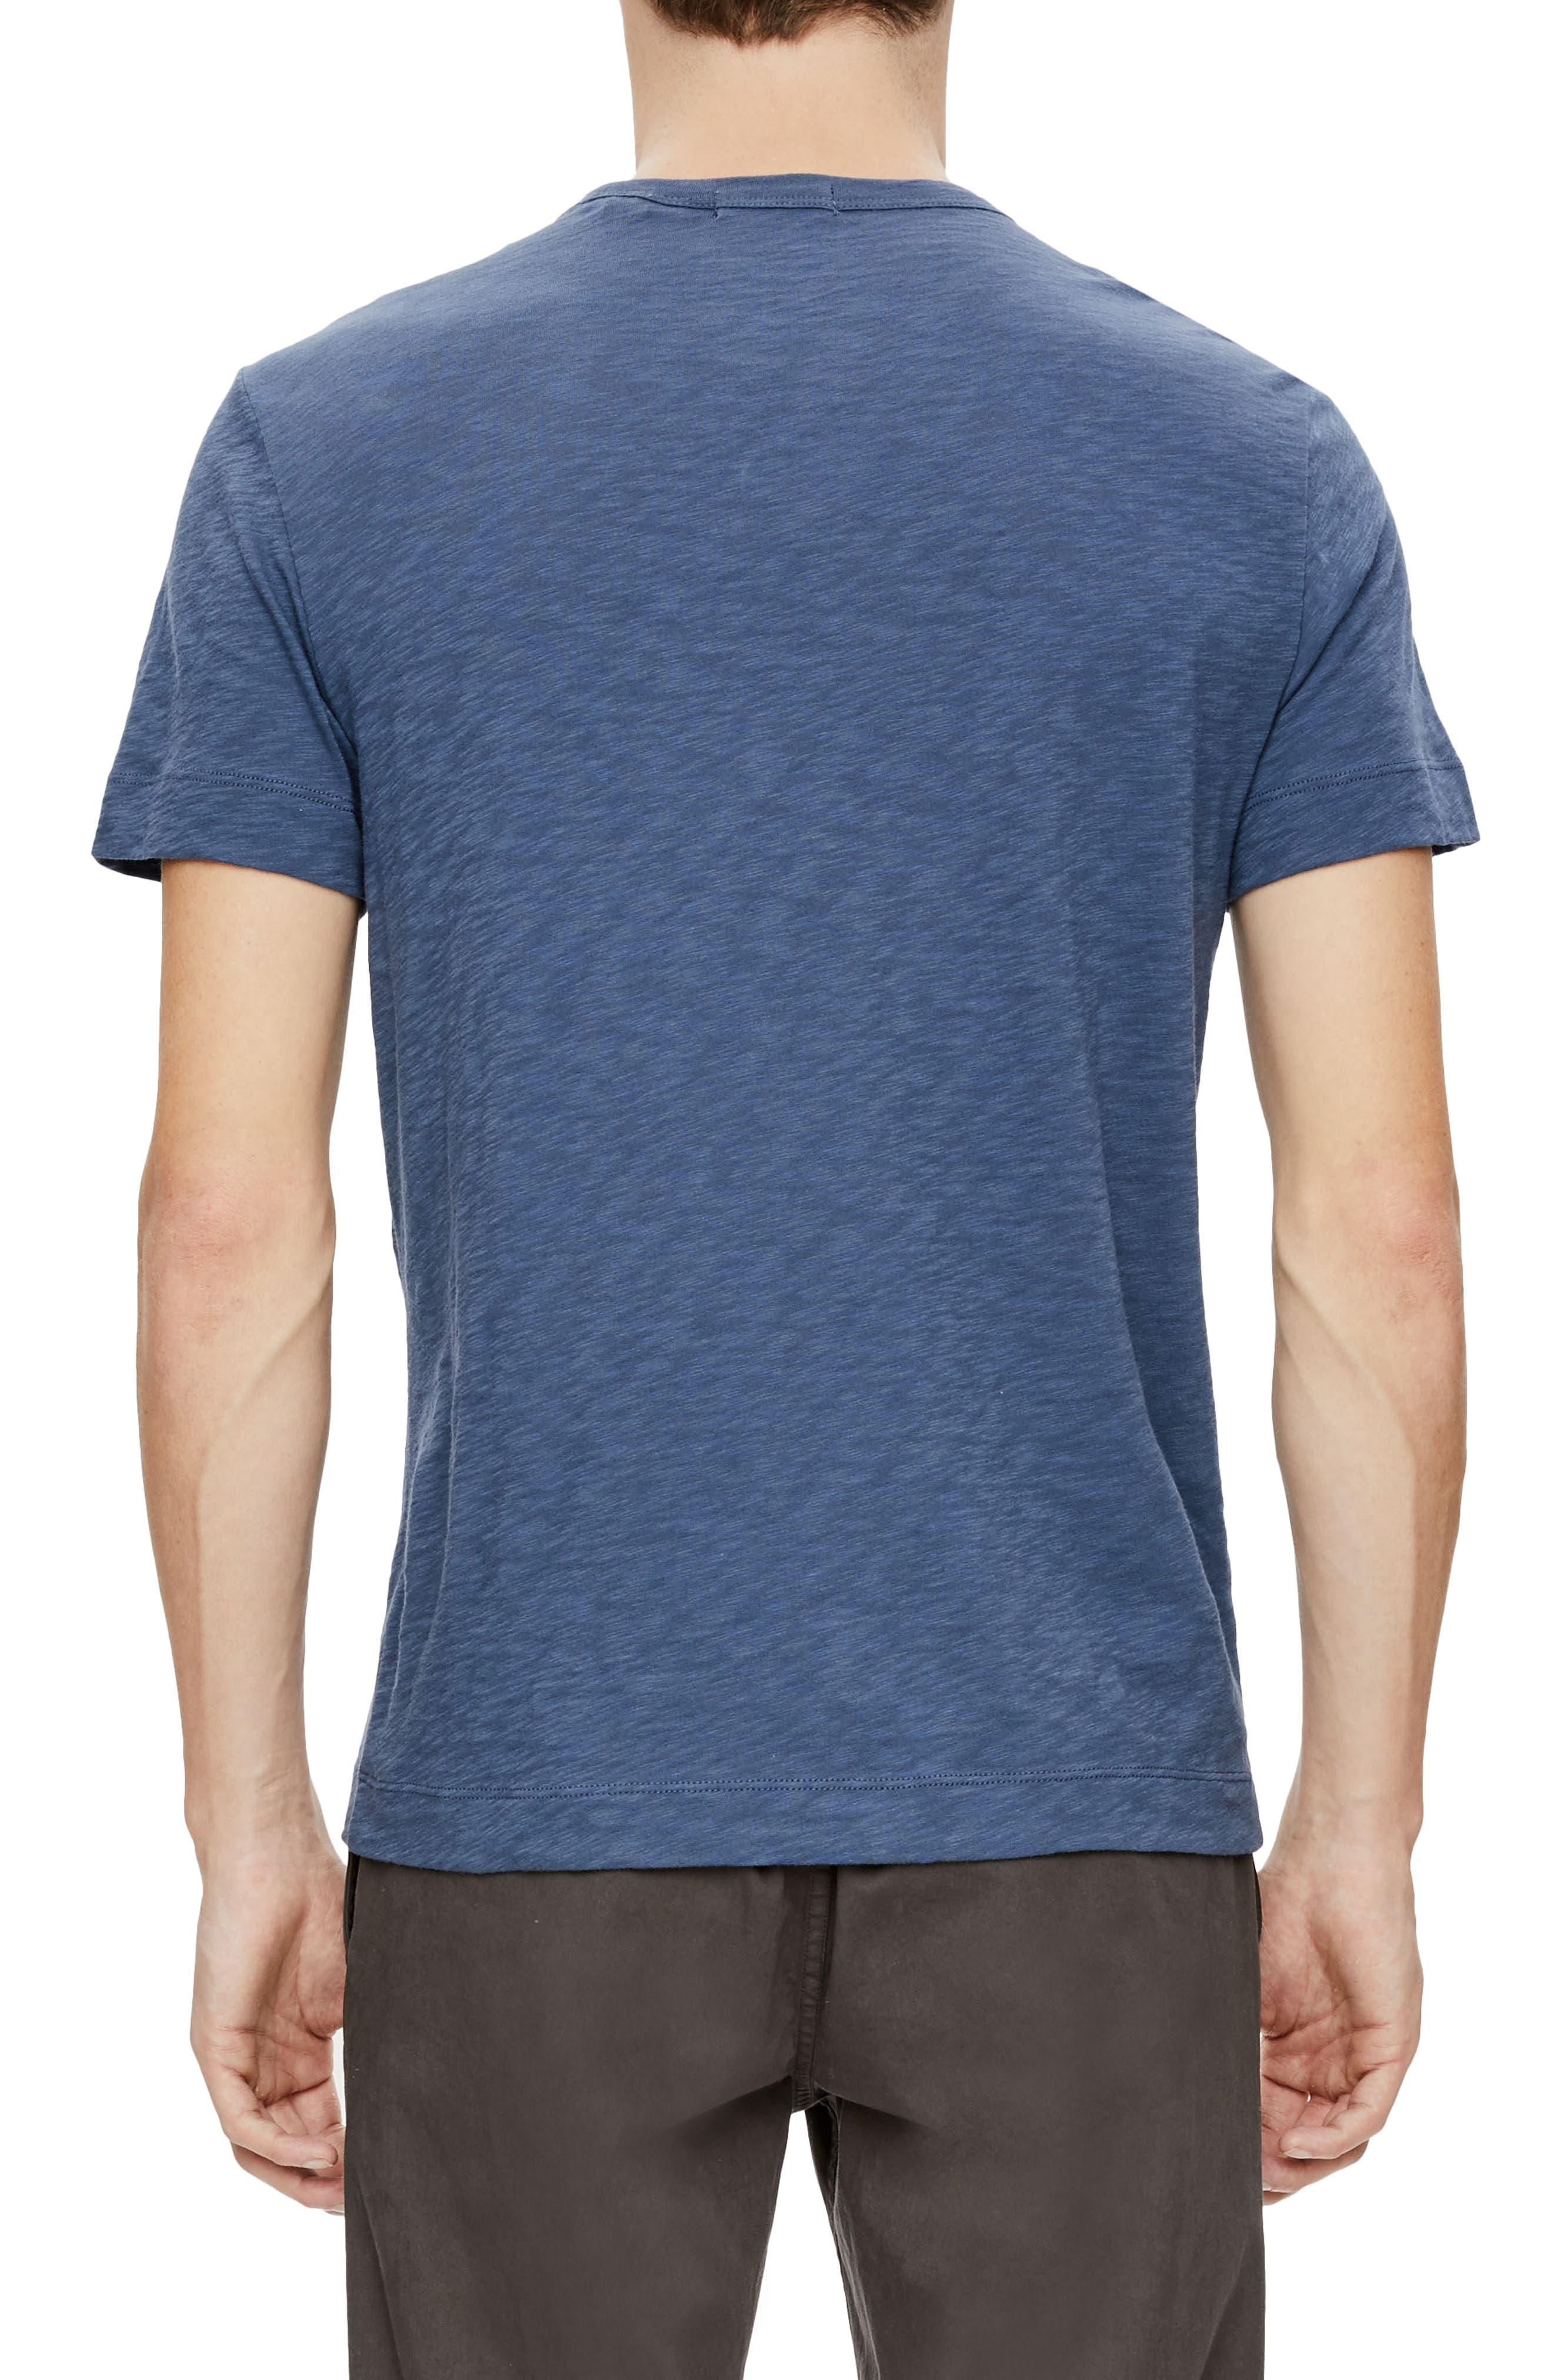 Gaskell Nebulous Slub Pocket T-Shirt,                             Alternate thumbnail 2, color,                             400